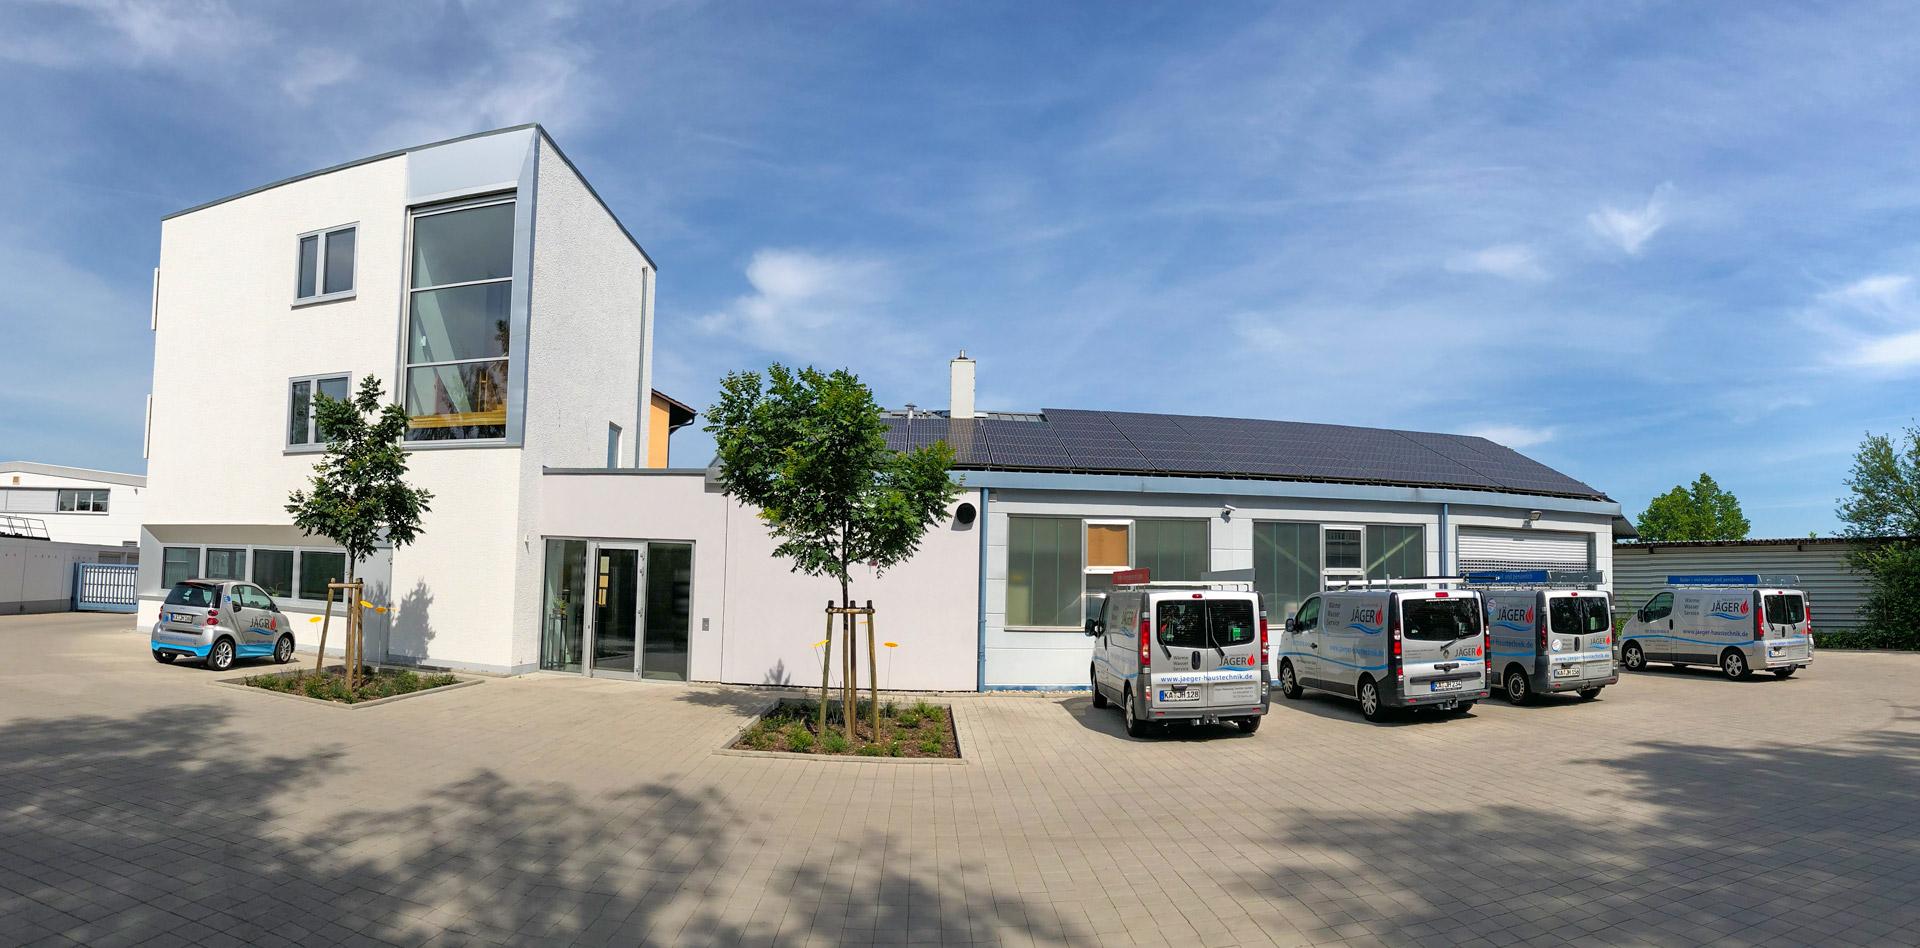 Qbus Firmengebäude der Jäger Haustechnik Karlsruhe